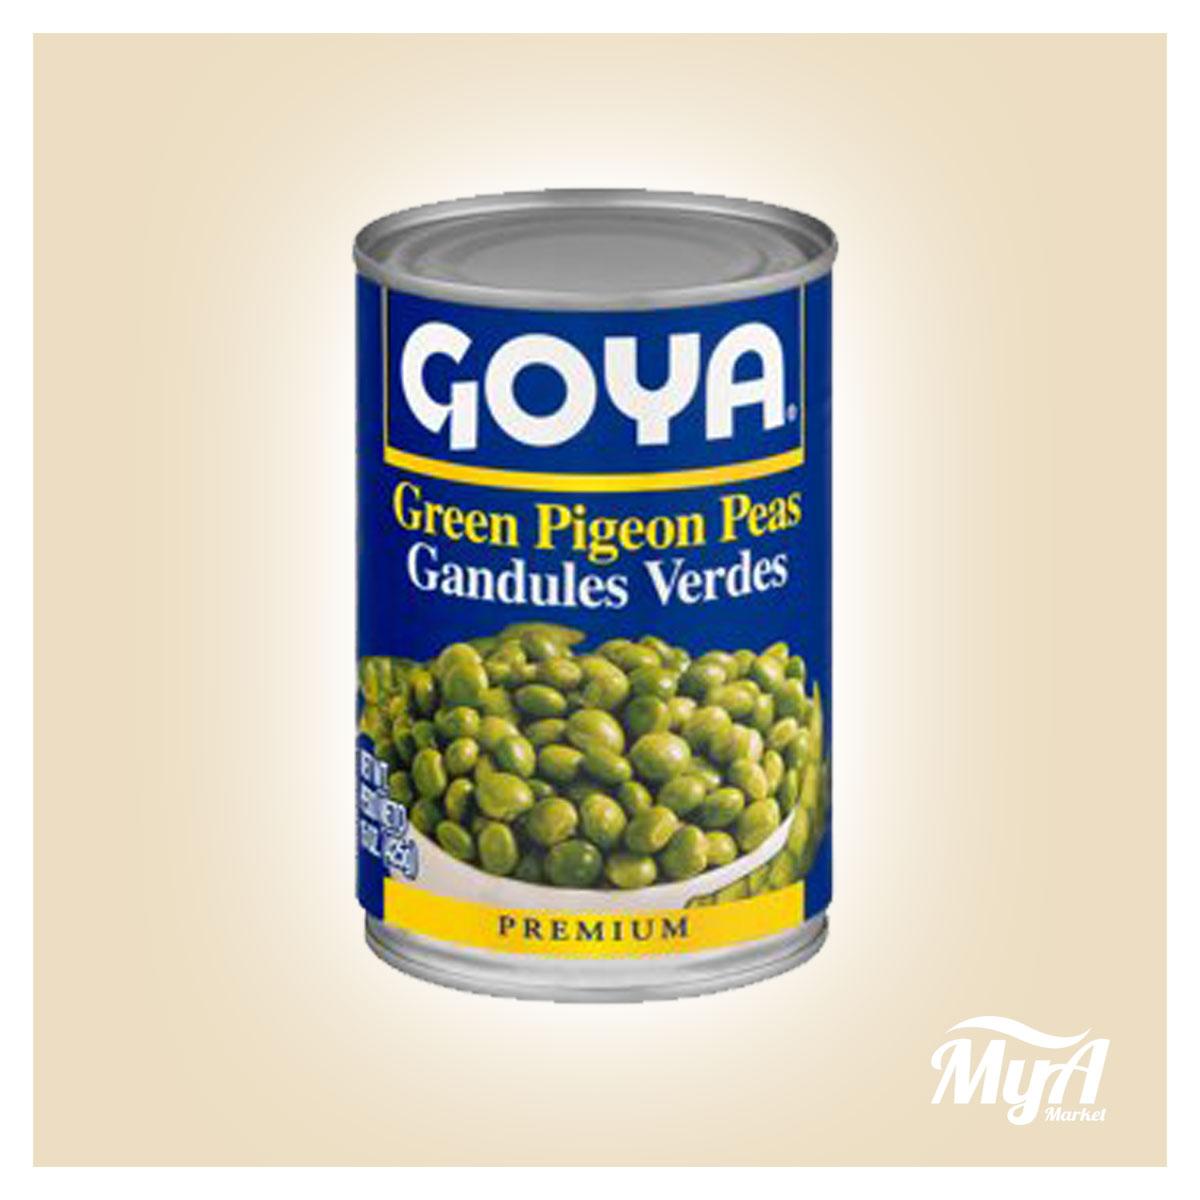 Guandules Verdes Goya